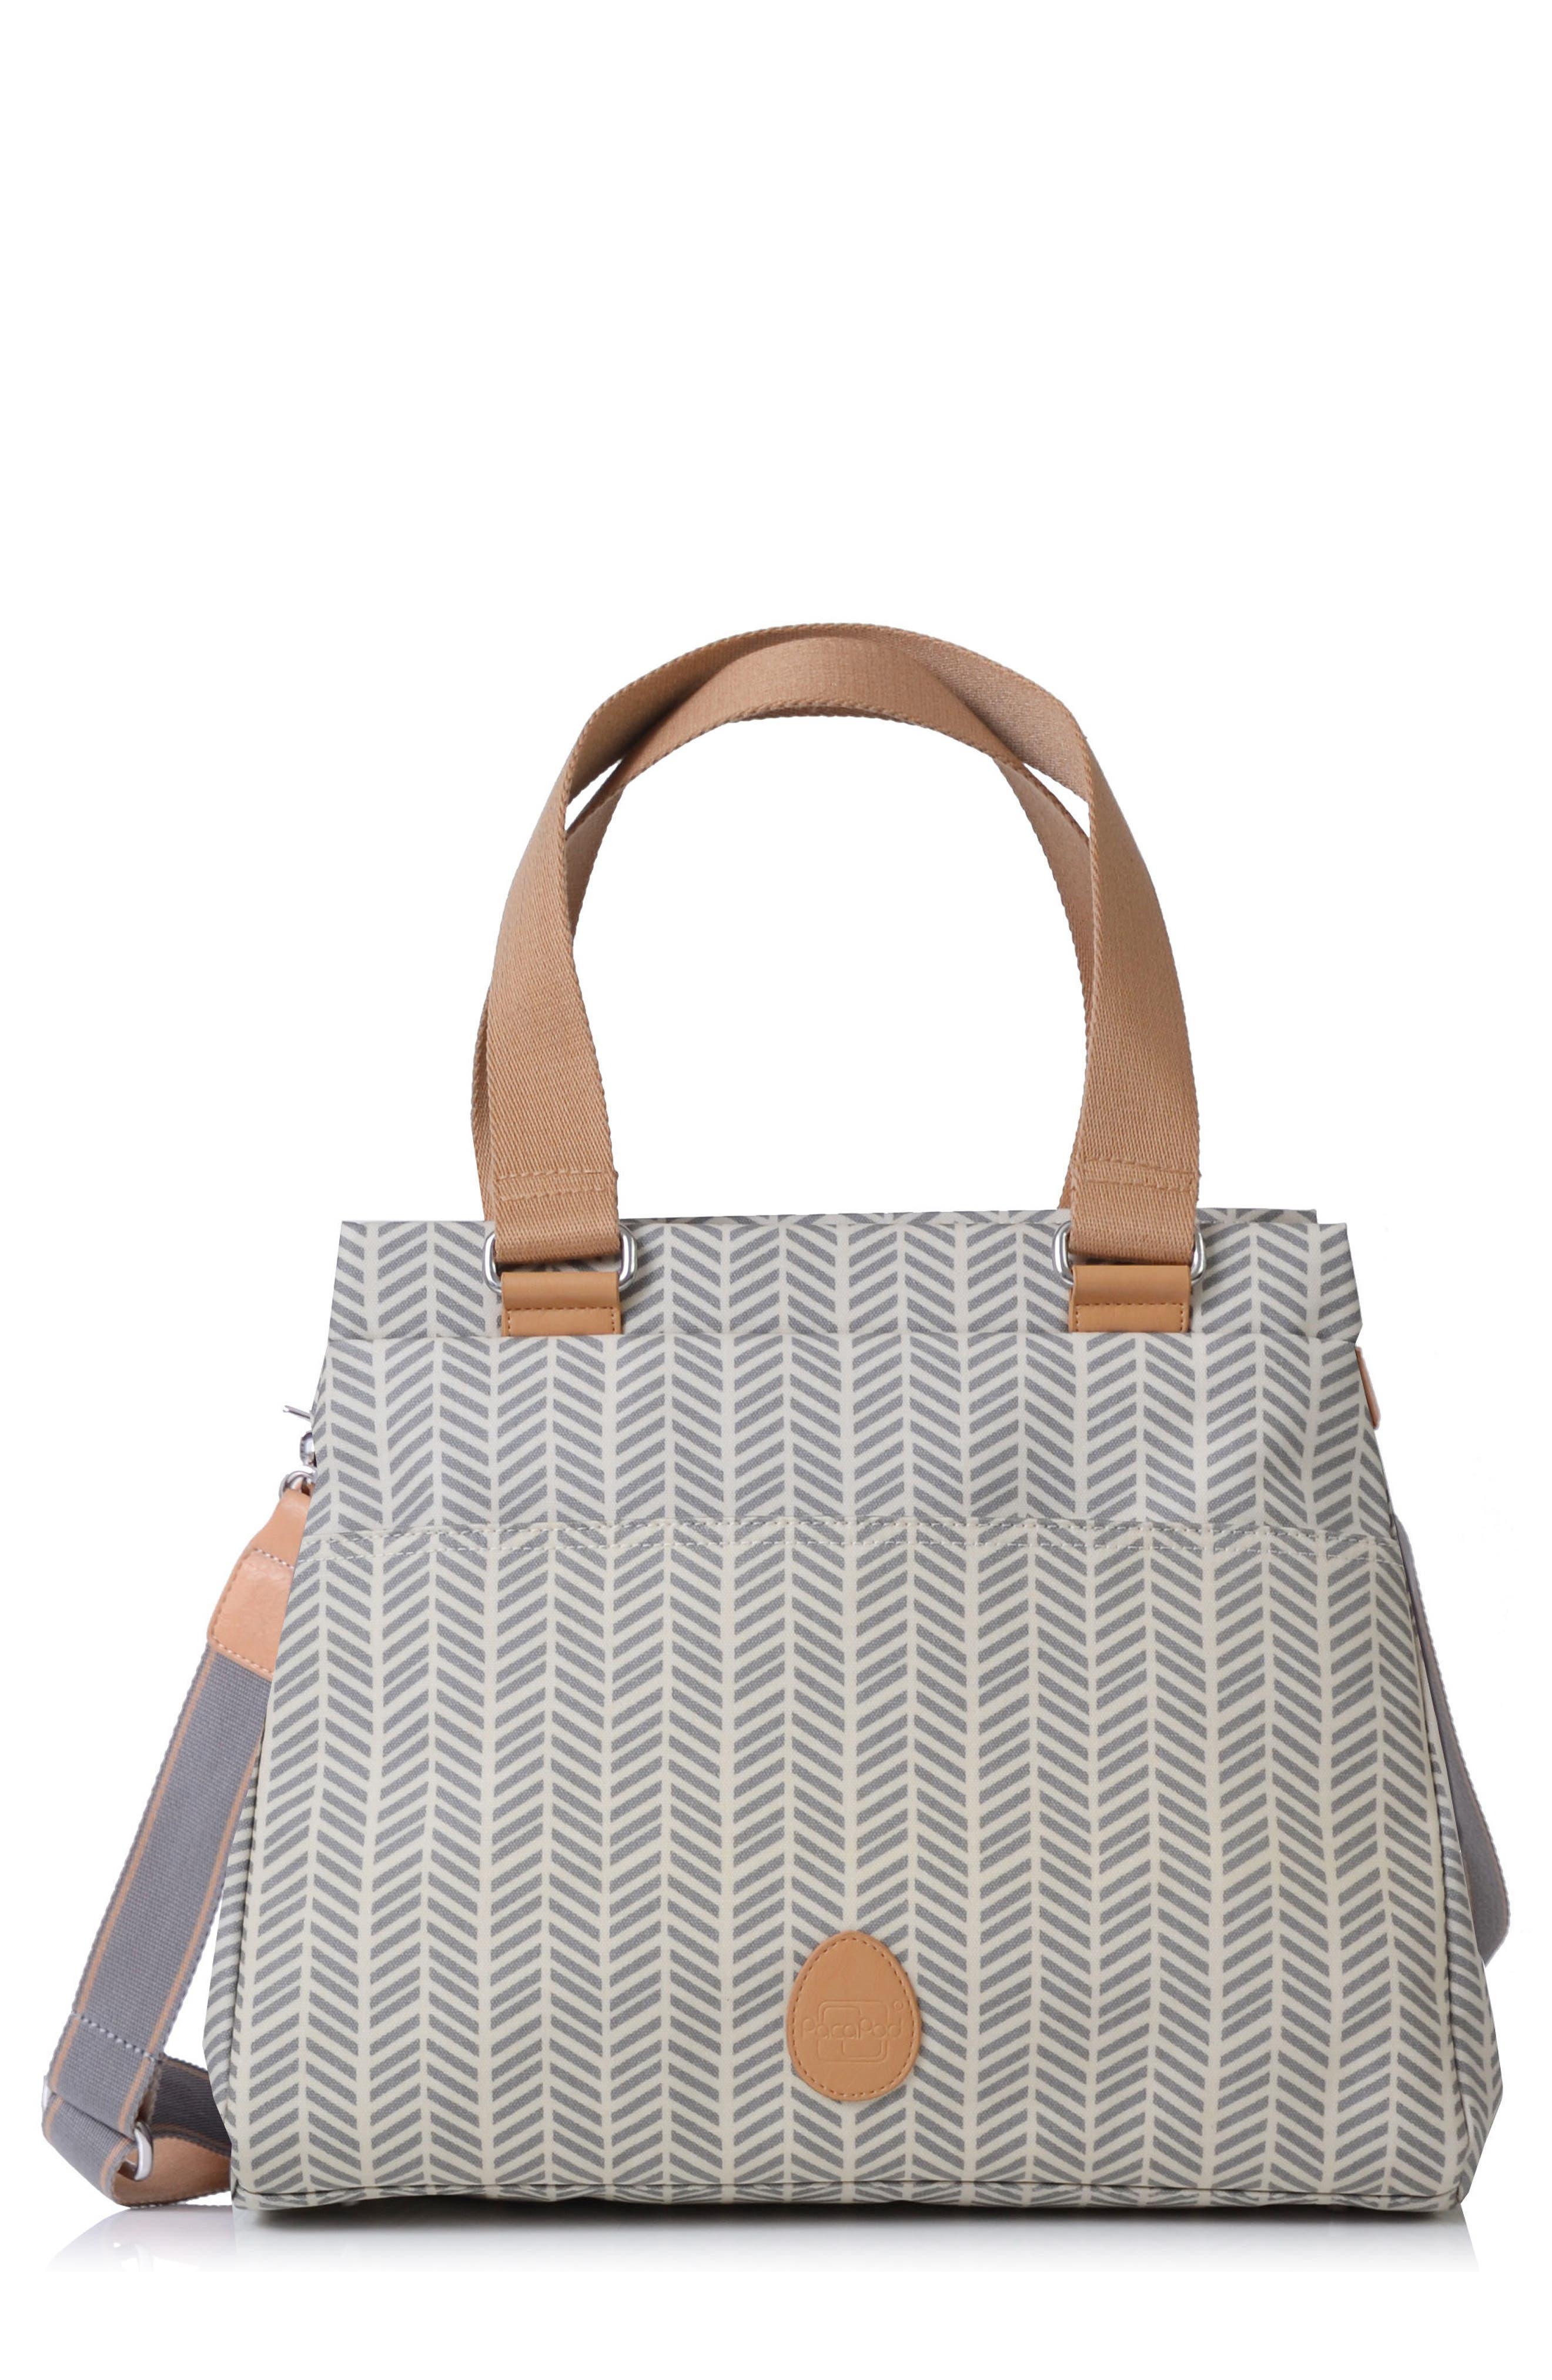 Alternate Image 1 Selected - PacaPod 'Richmond' Diaper Bag